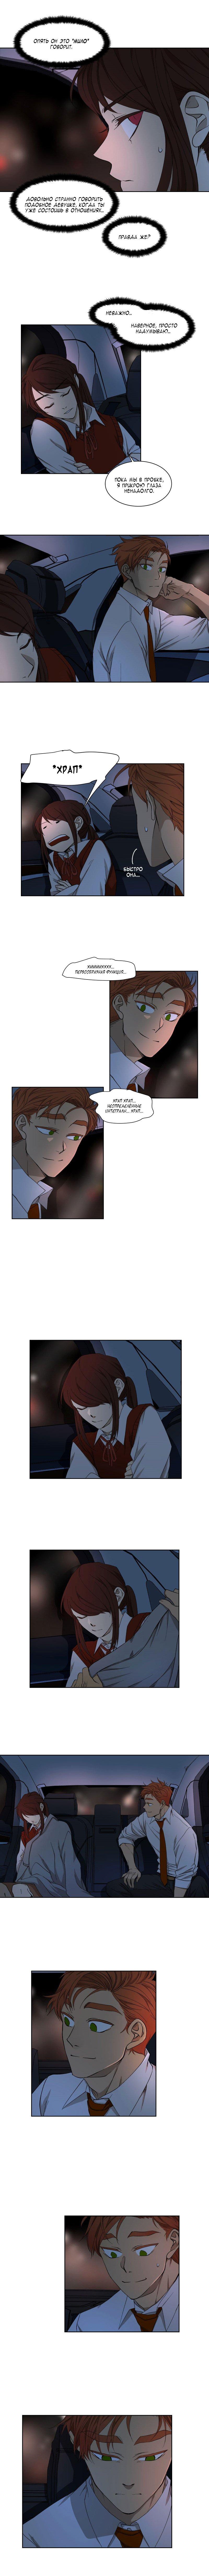 Манга Я люблю Ю / I love Yoo  - Том 1 Глава 28 Страница 3